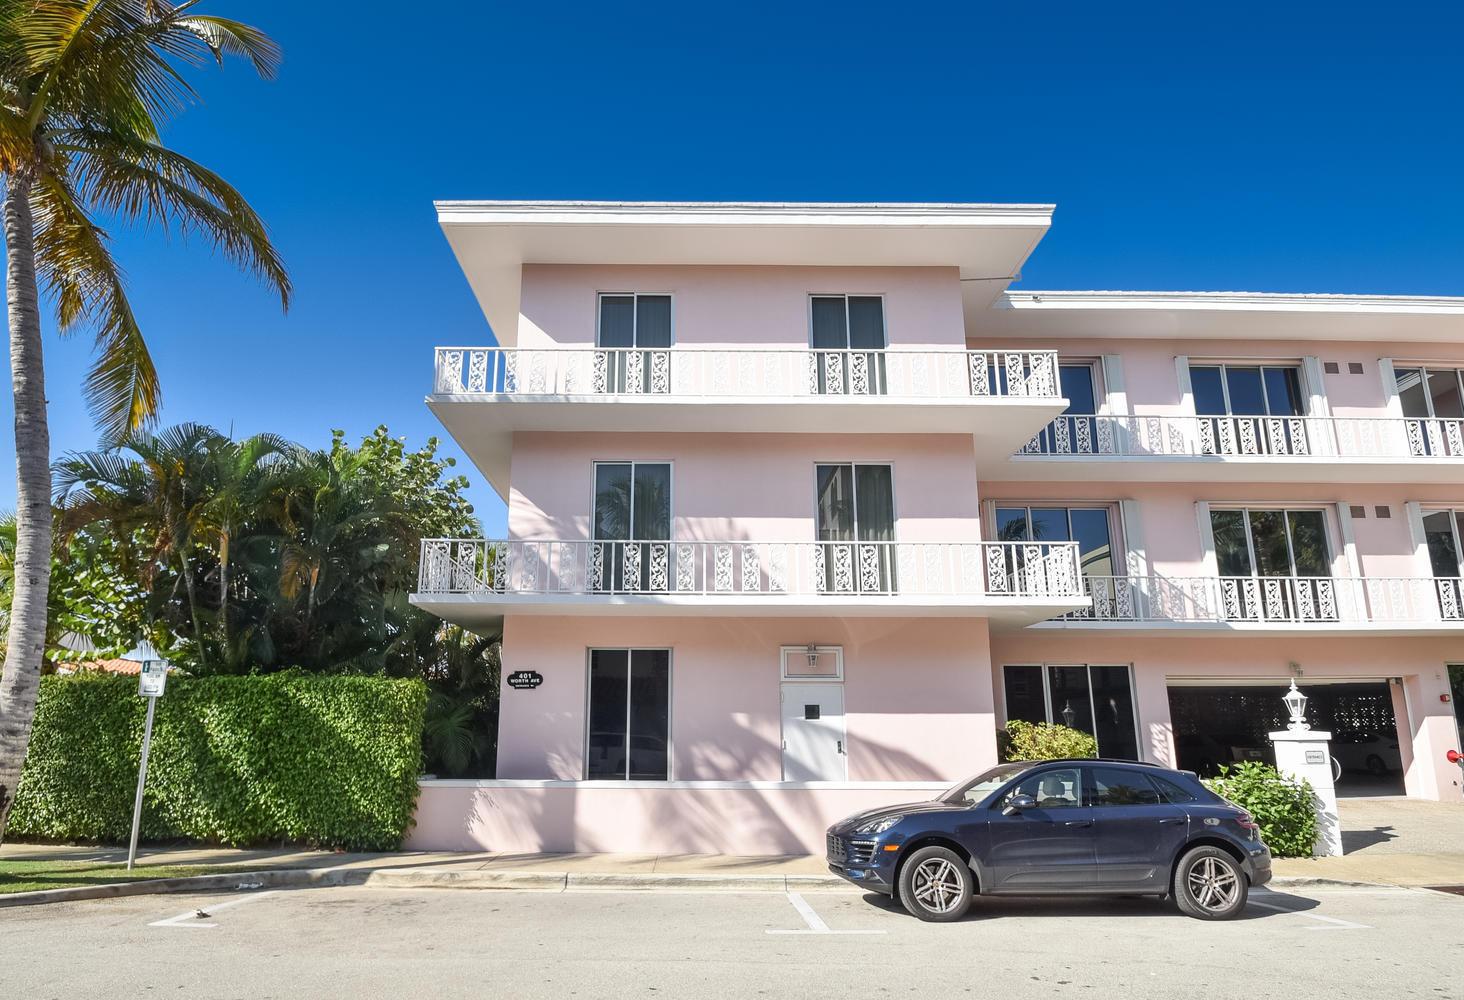 401 WORTH PALM BEACH FLORIDA